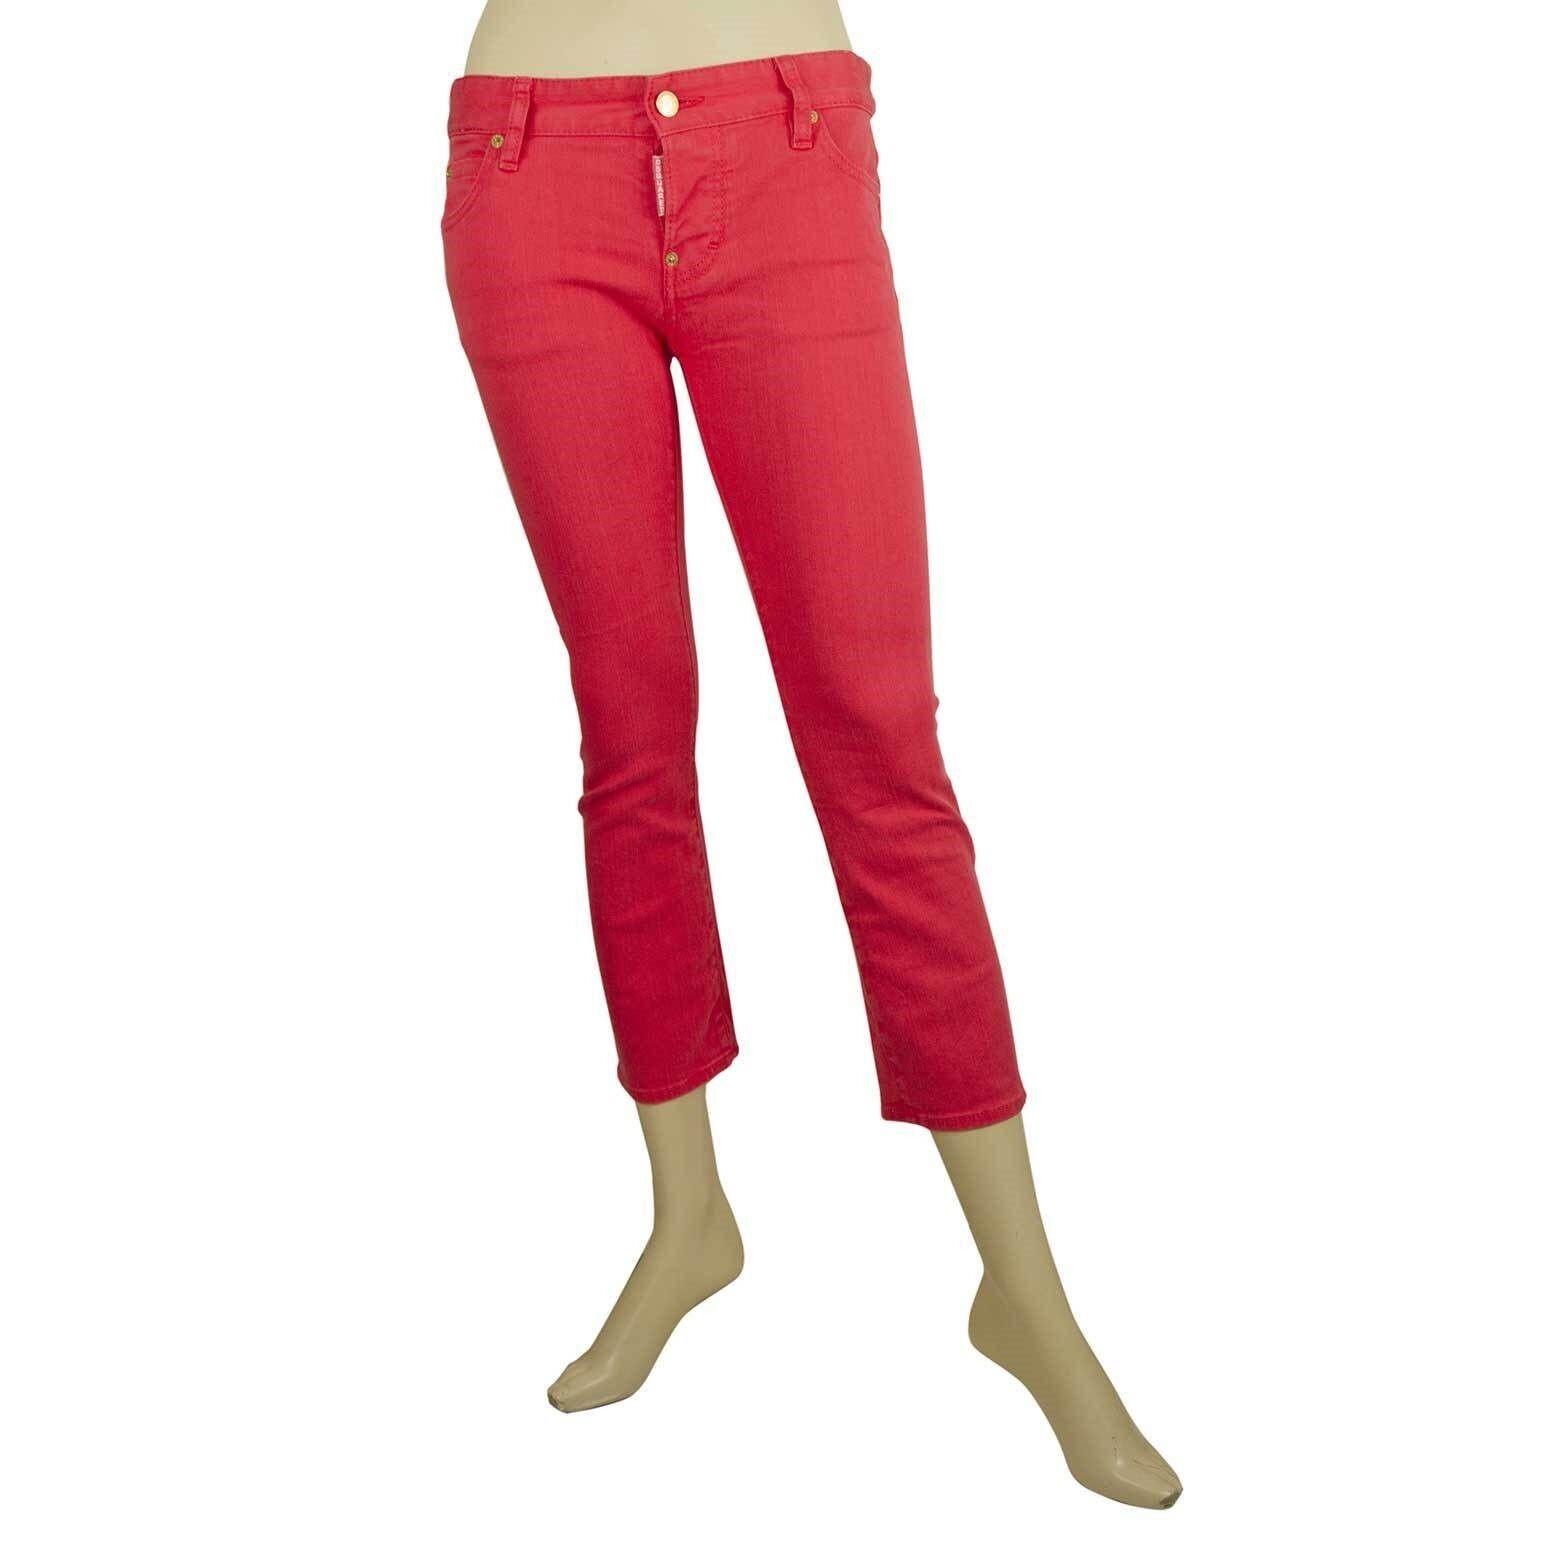 Dsquared 2 D2 Magenta Pink Capri Cropped Skinny Trousers Pants S75LA0378 sz 38